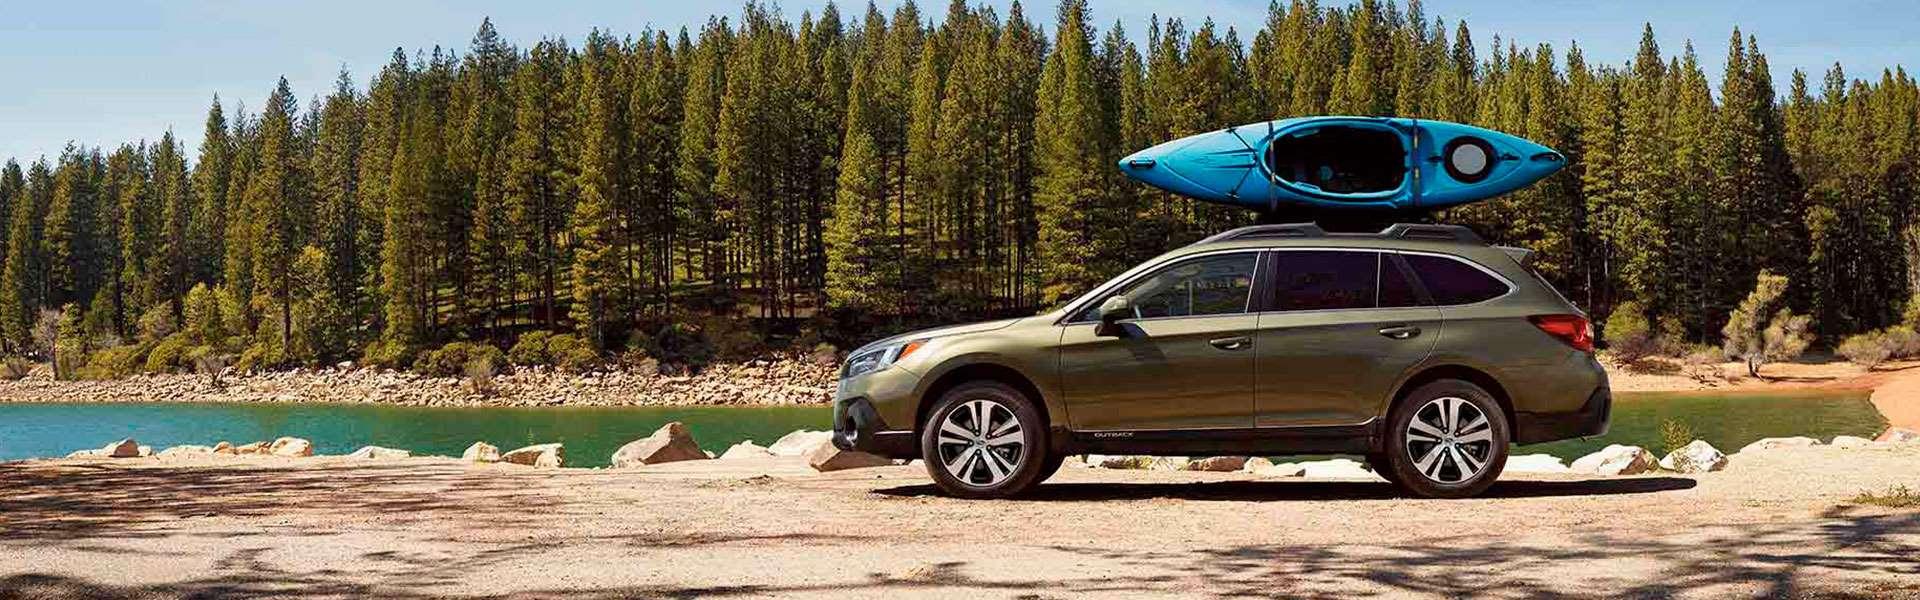 Subaru Outback - обзор